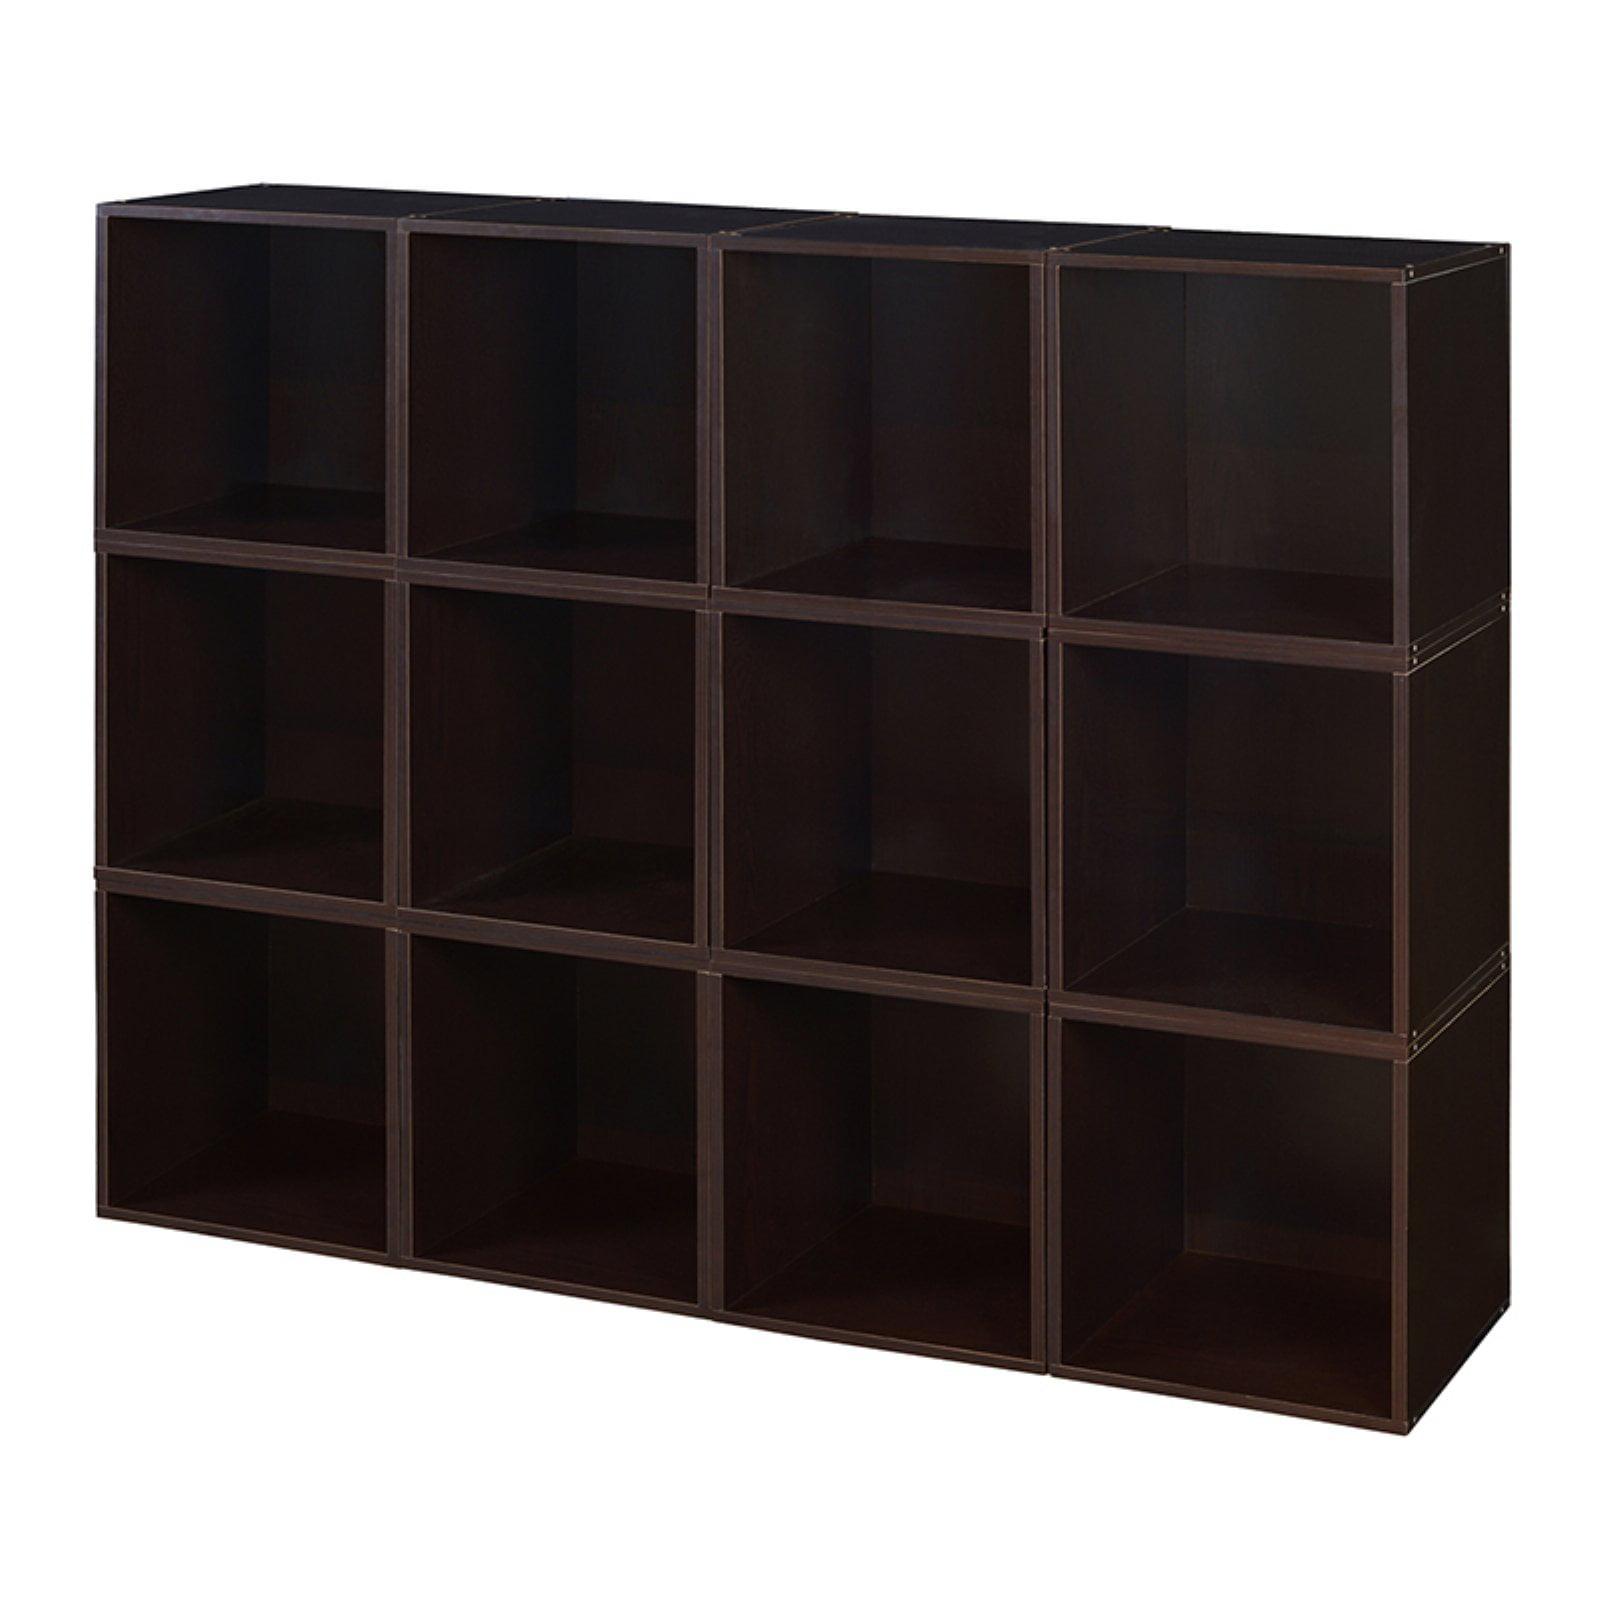 Regency Niche Cubo Twelve Cube Storage Unit